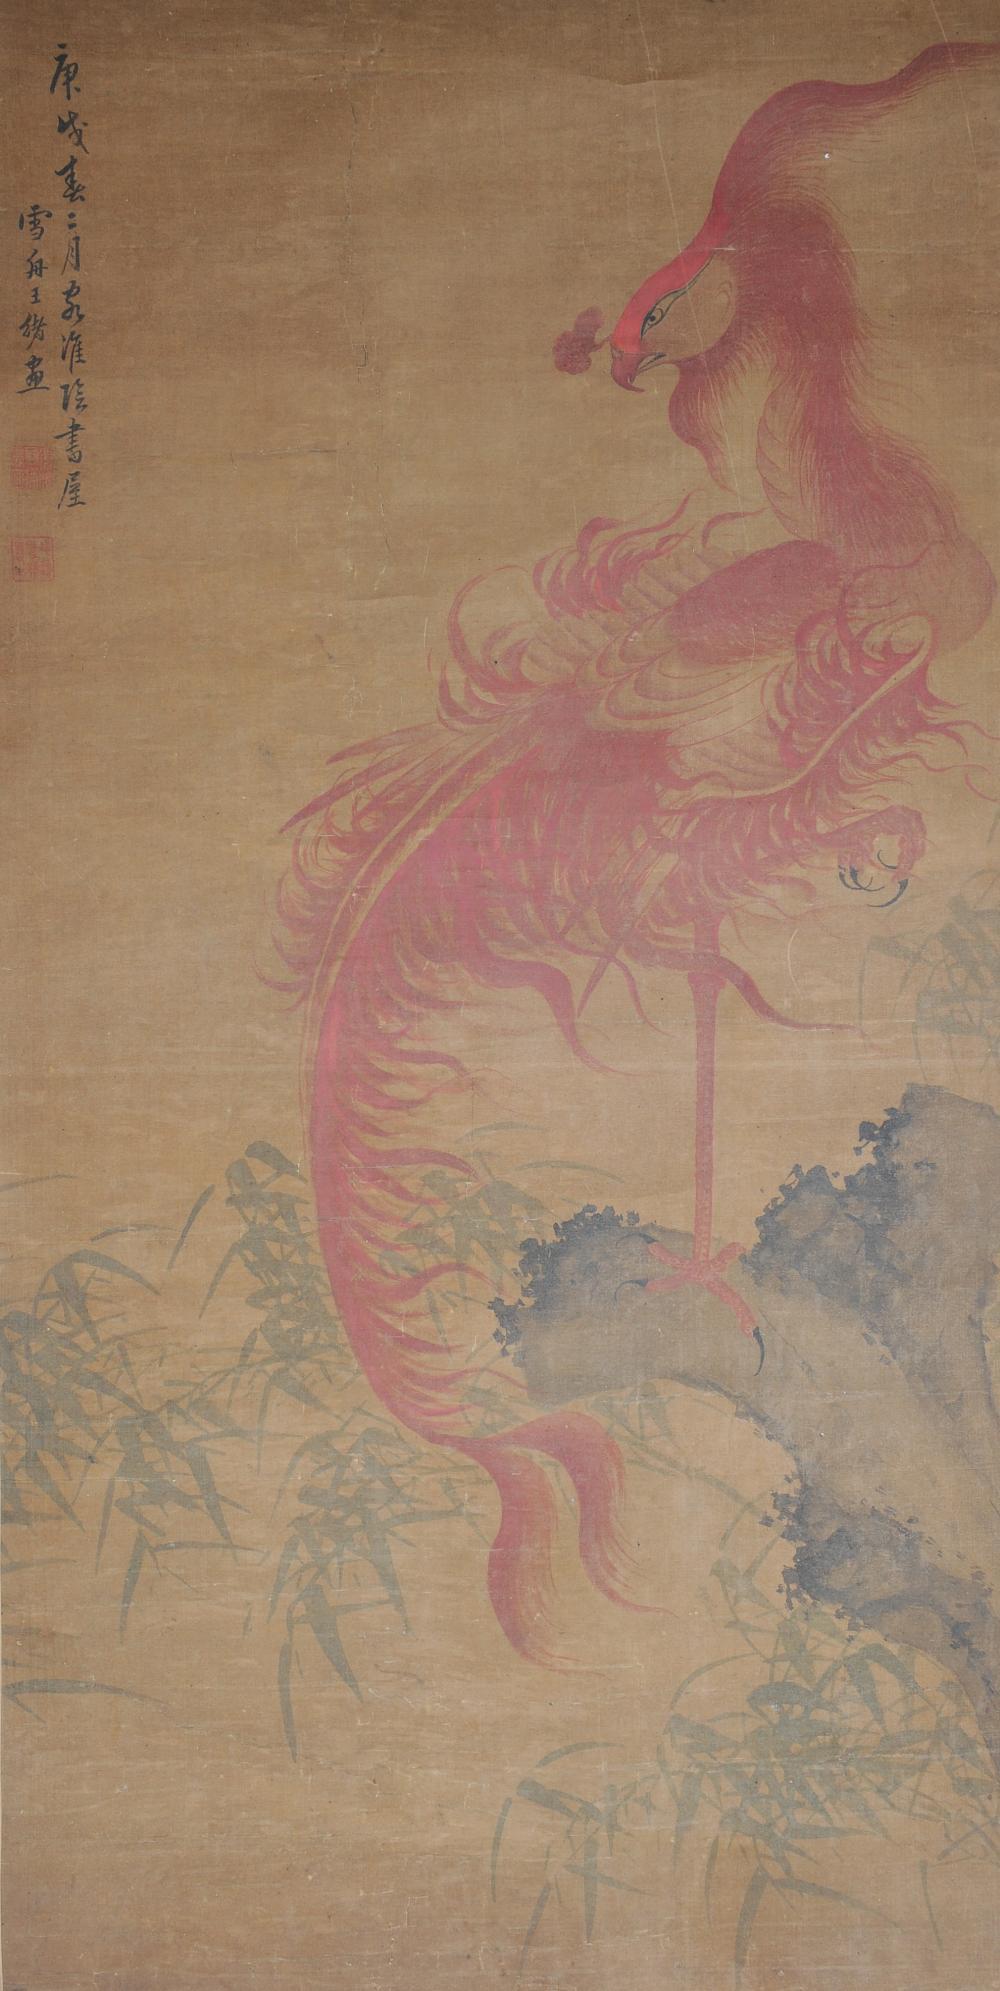 CHINESE PAINTING OF A PHOENIX BY WANG XU